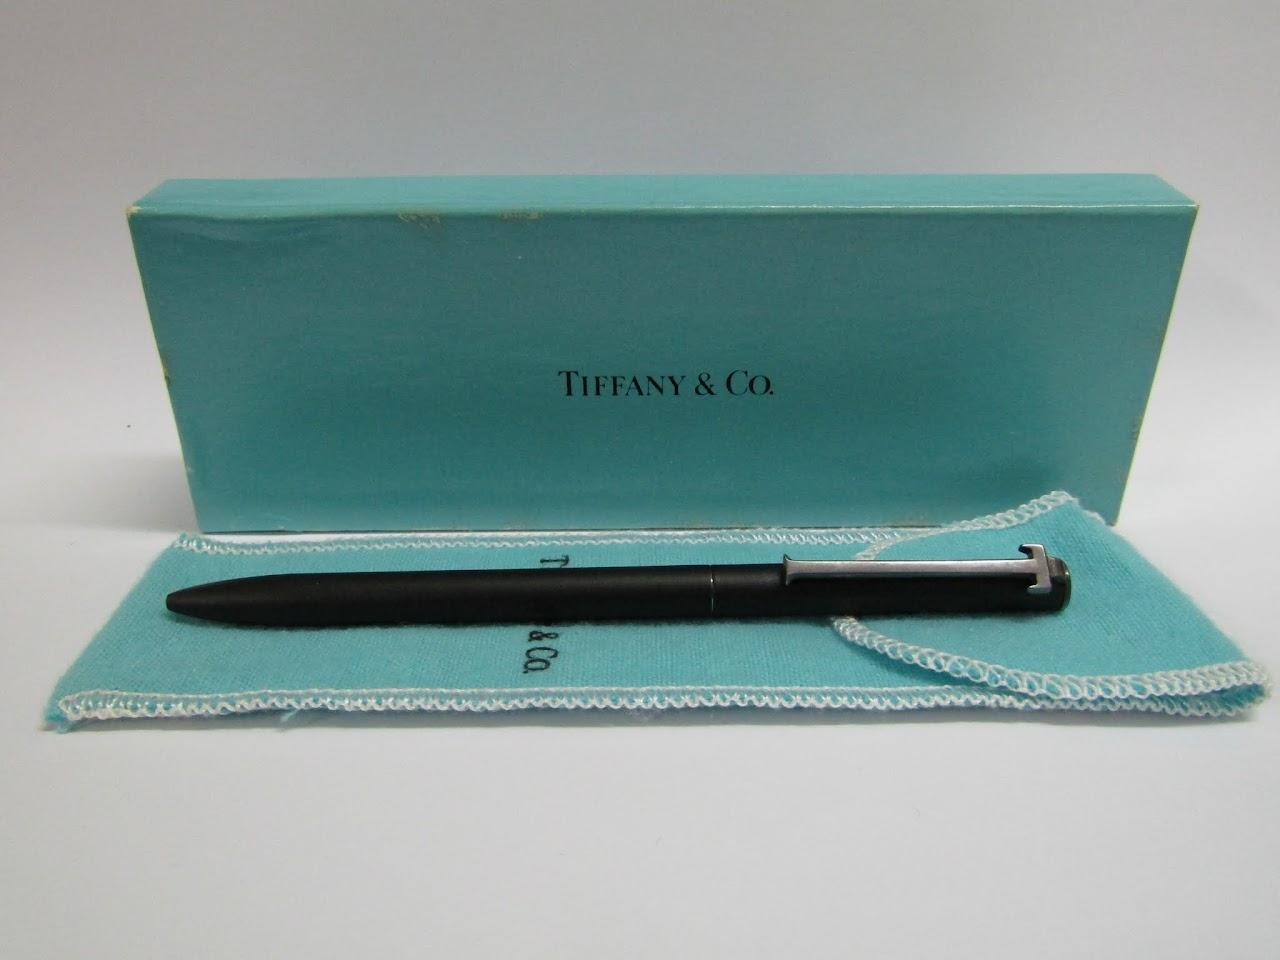 Tiffany & Co. T-Clip Pen